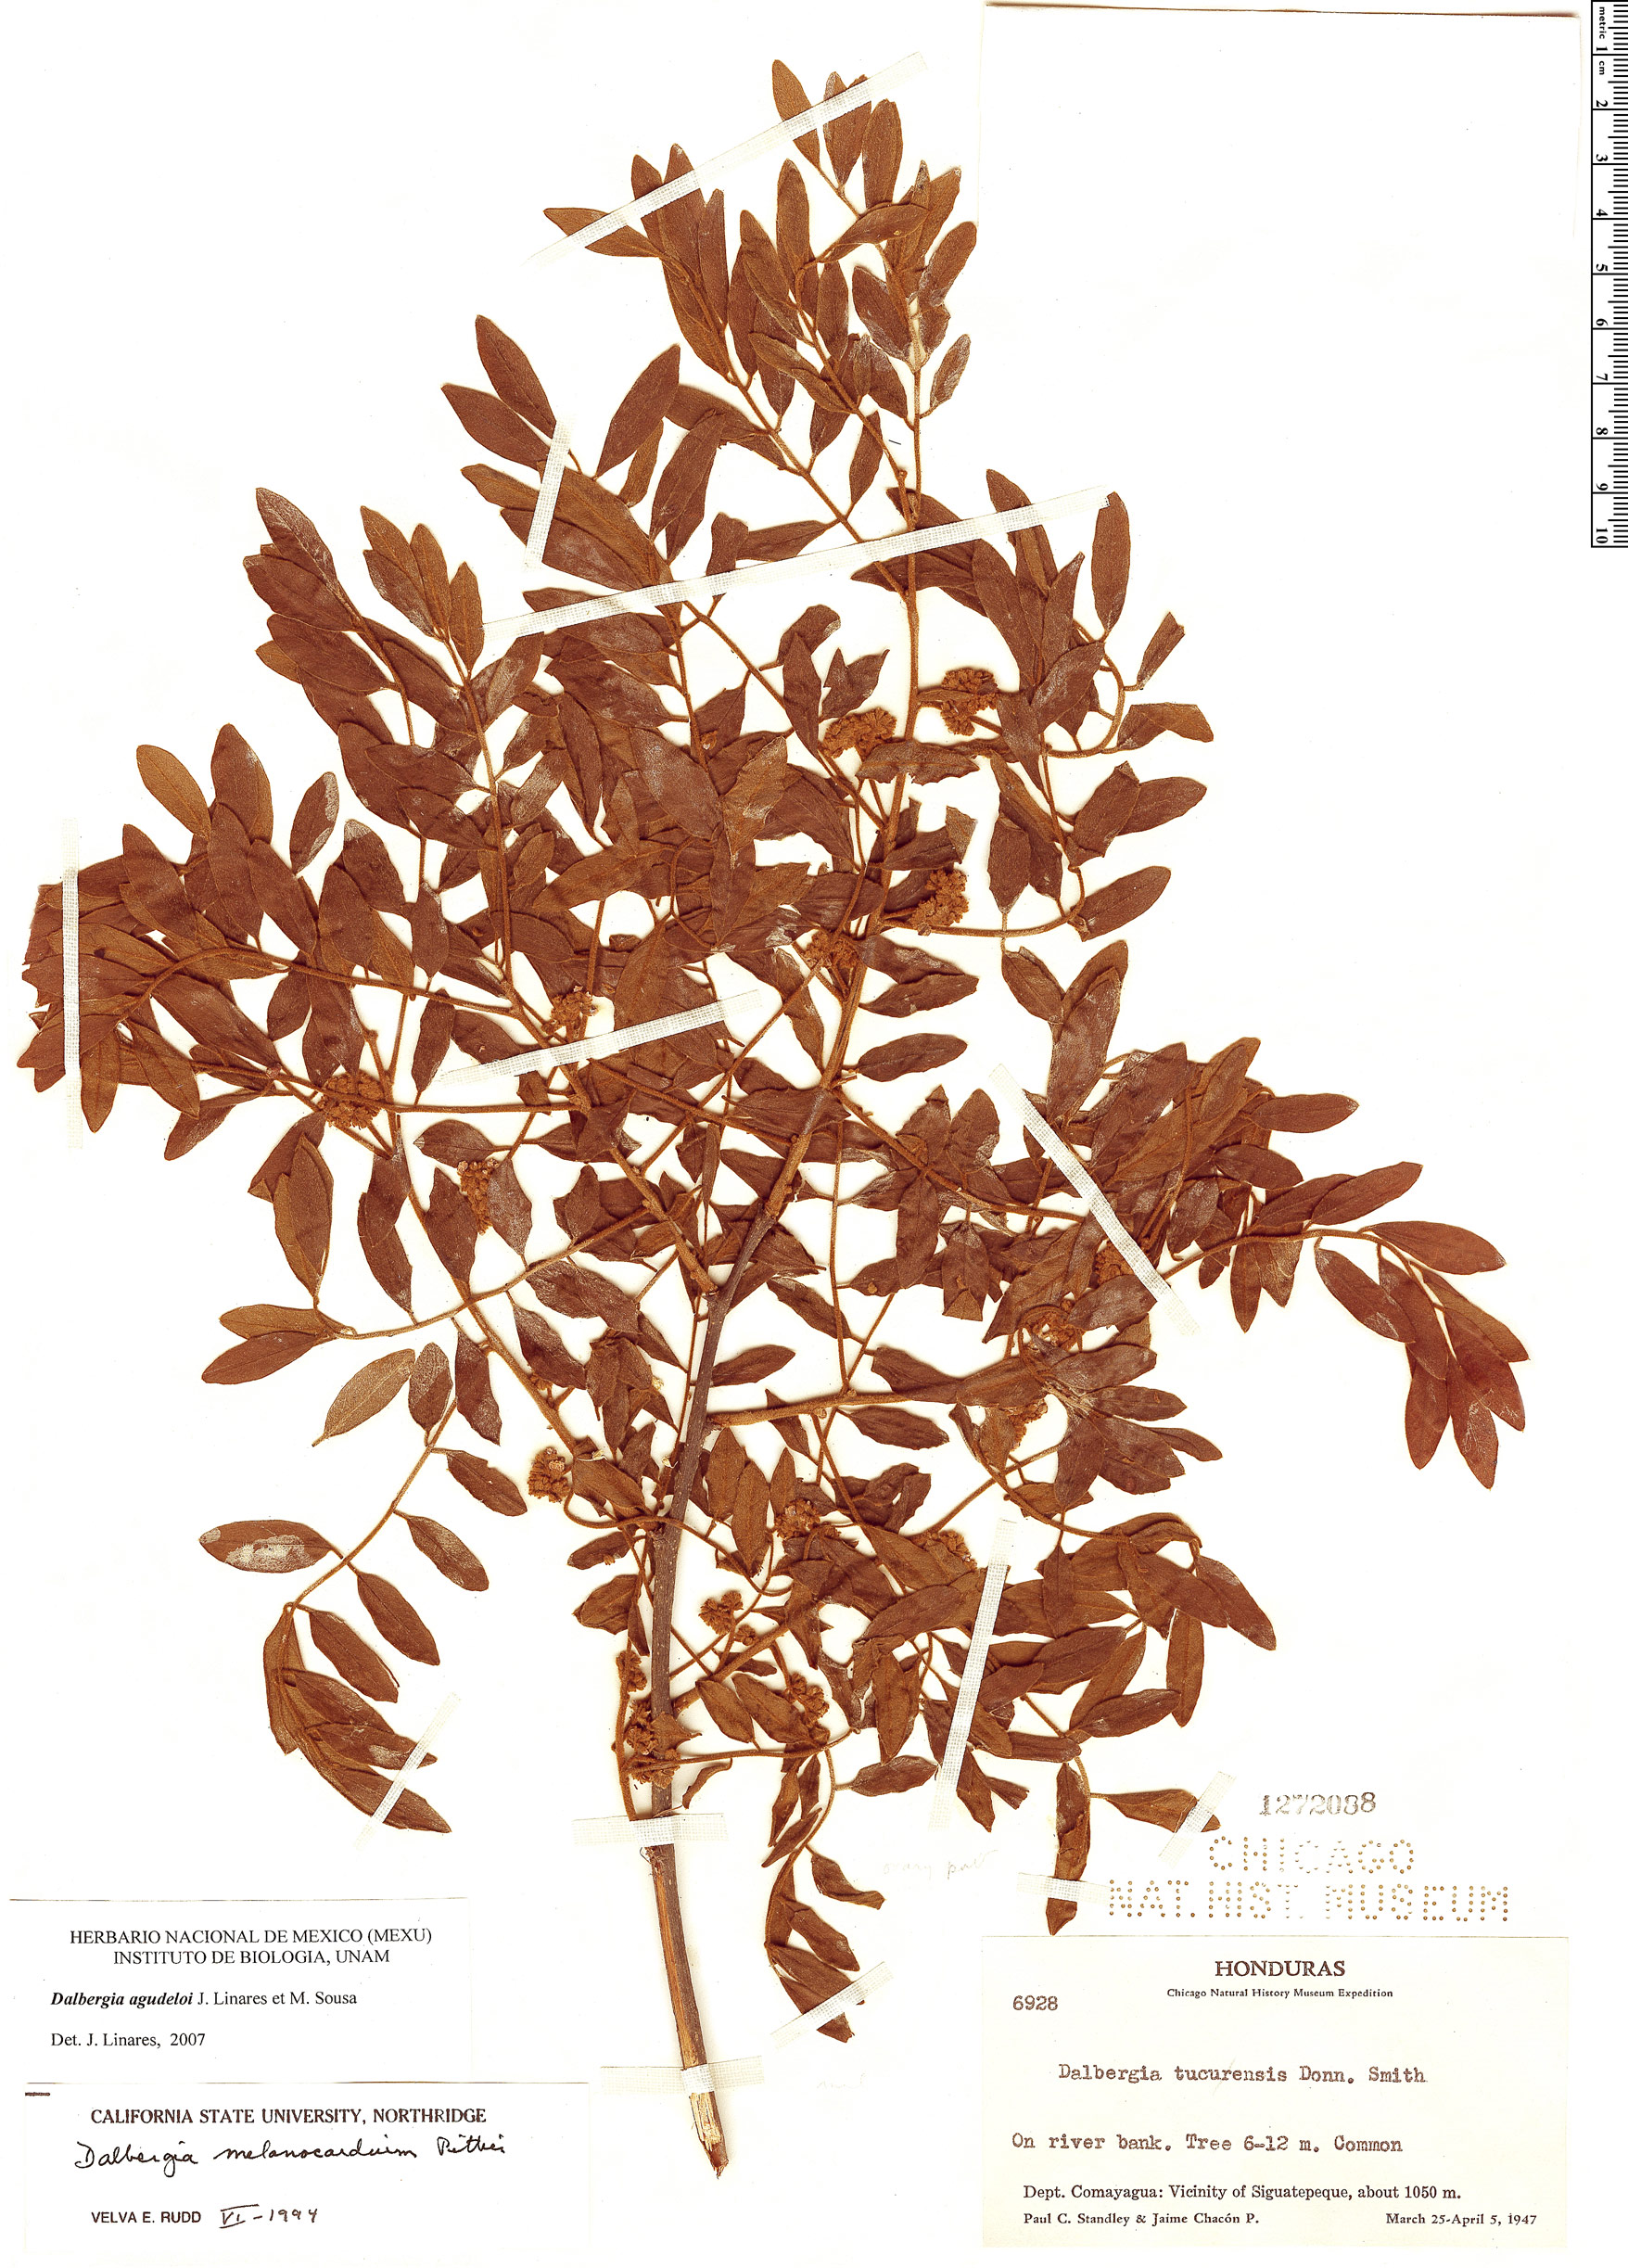 Specimen: Dalbergia agudeloi